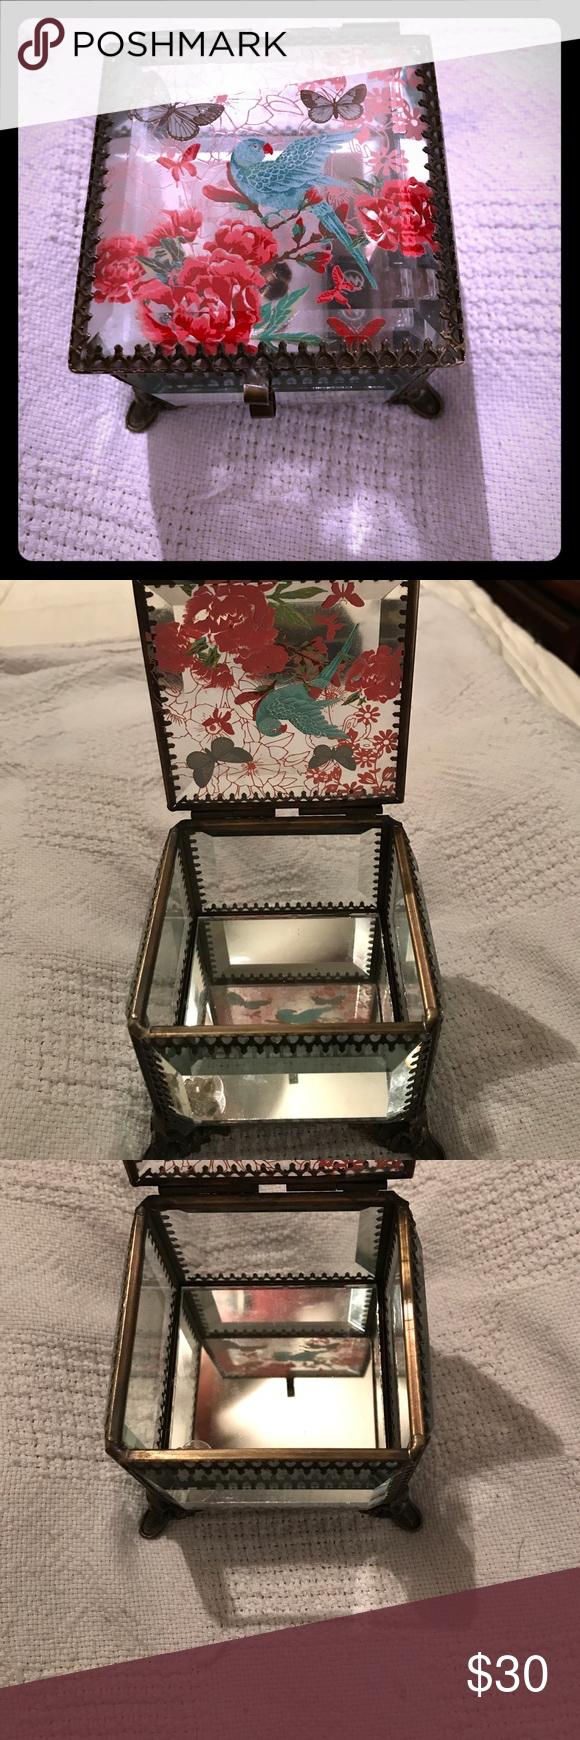 Nicole miller home jewelry box or trinket box Nicole miller Box